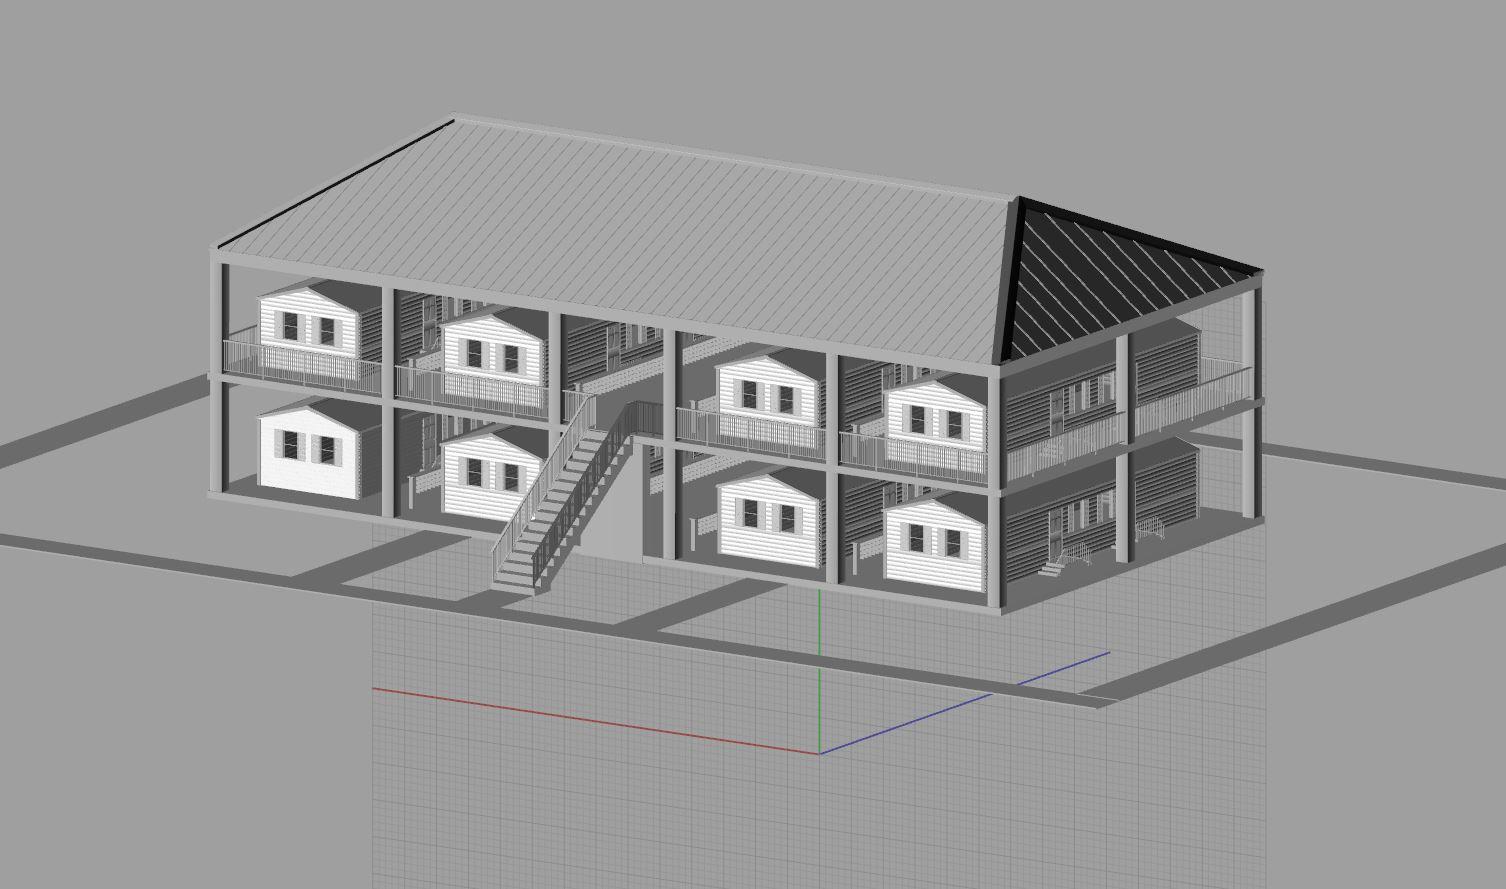 3D Modeling - Stuart, FL